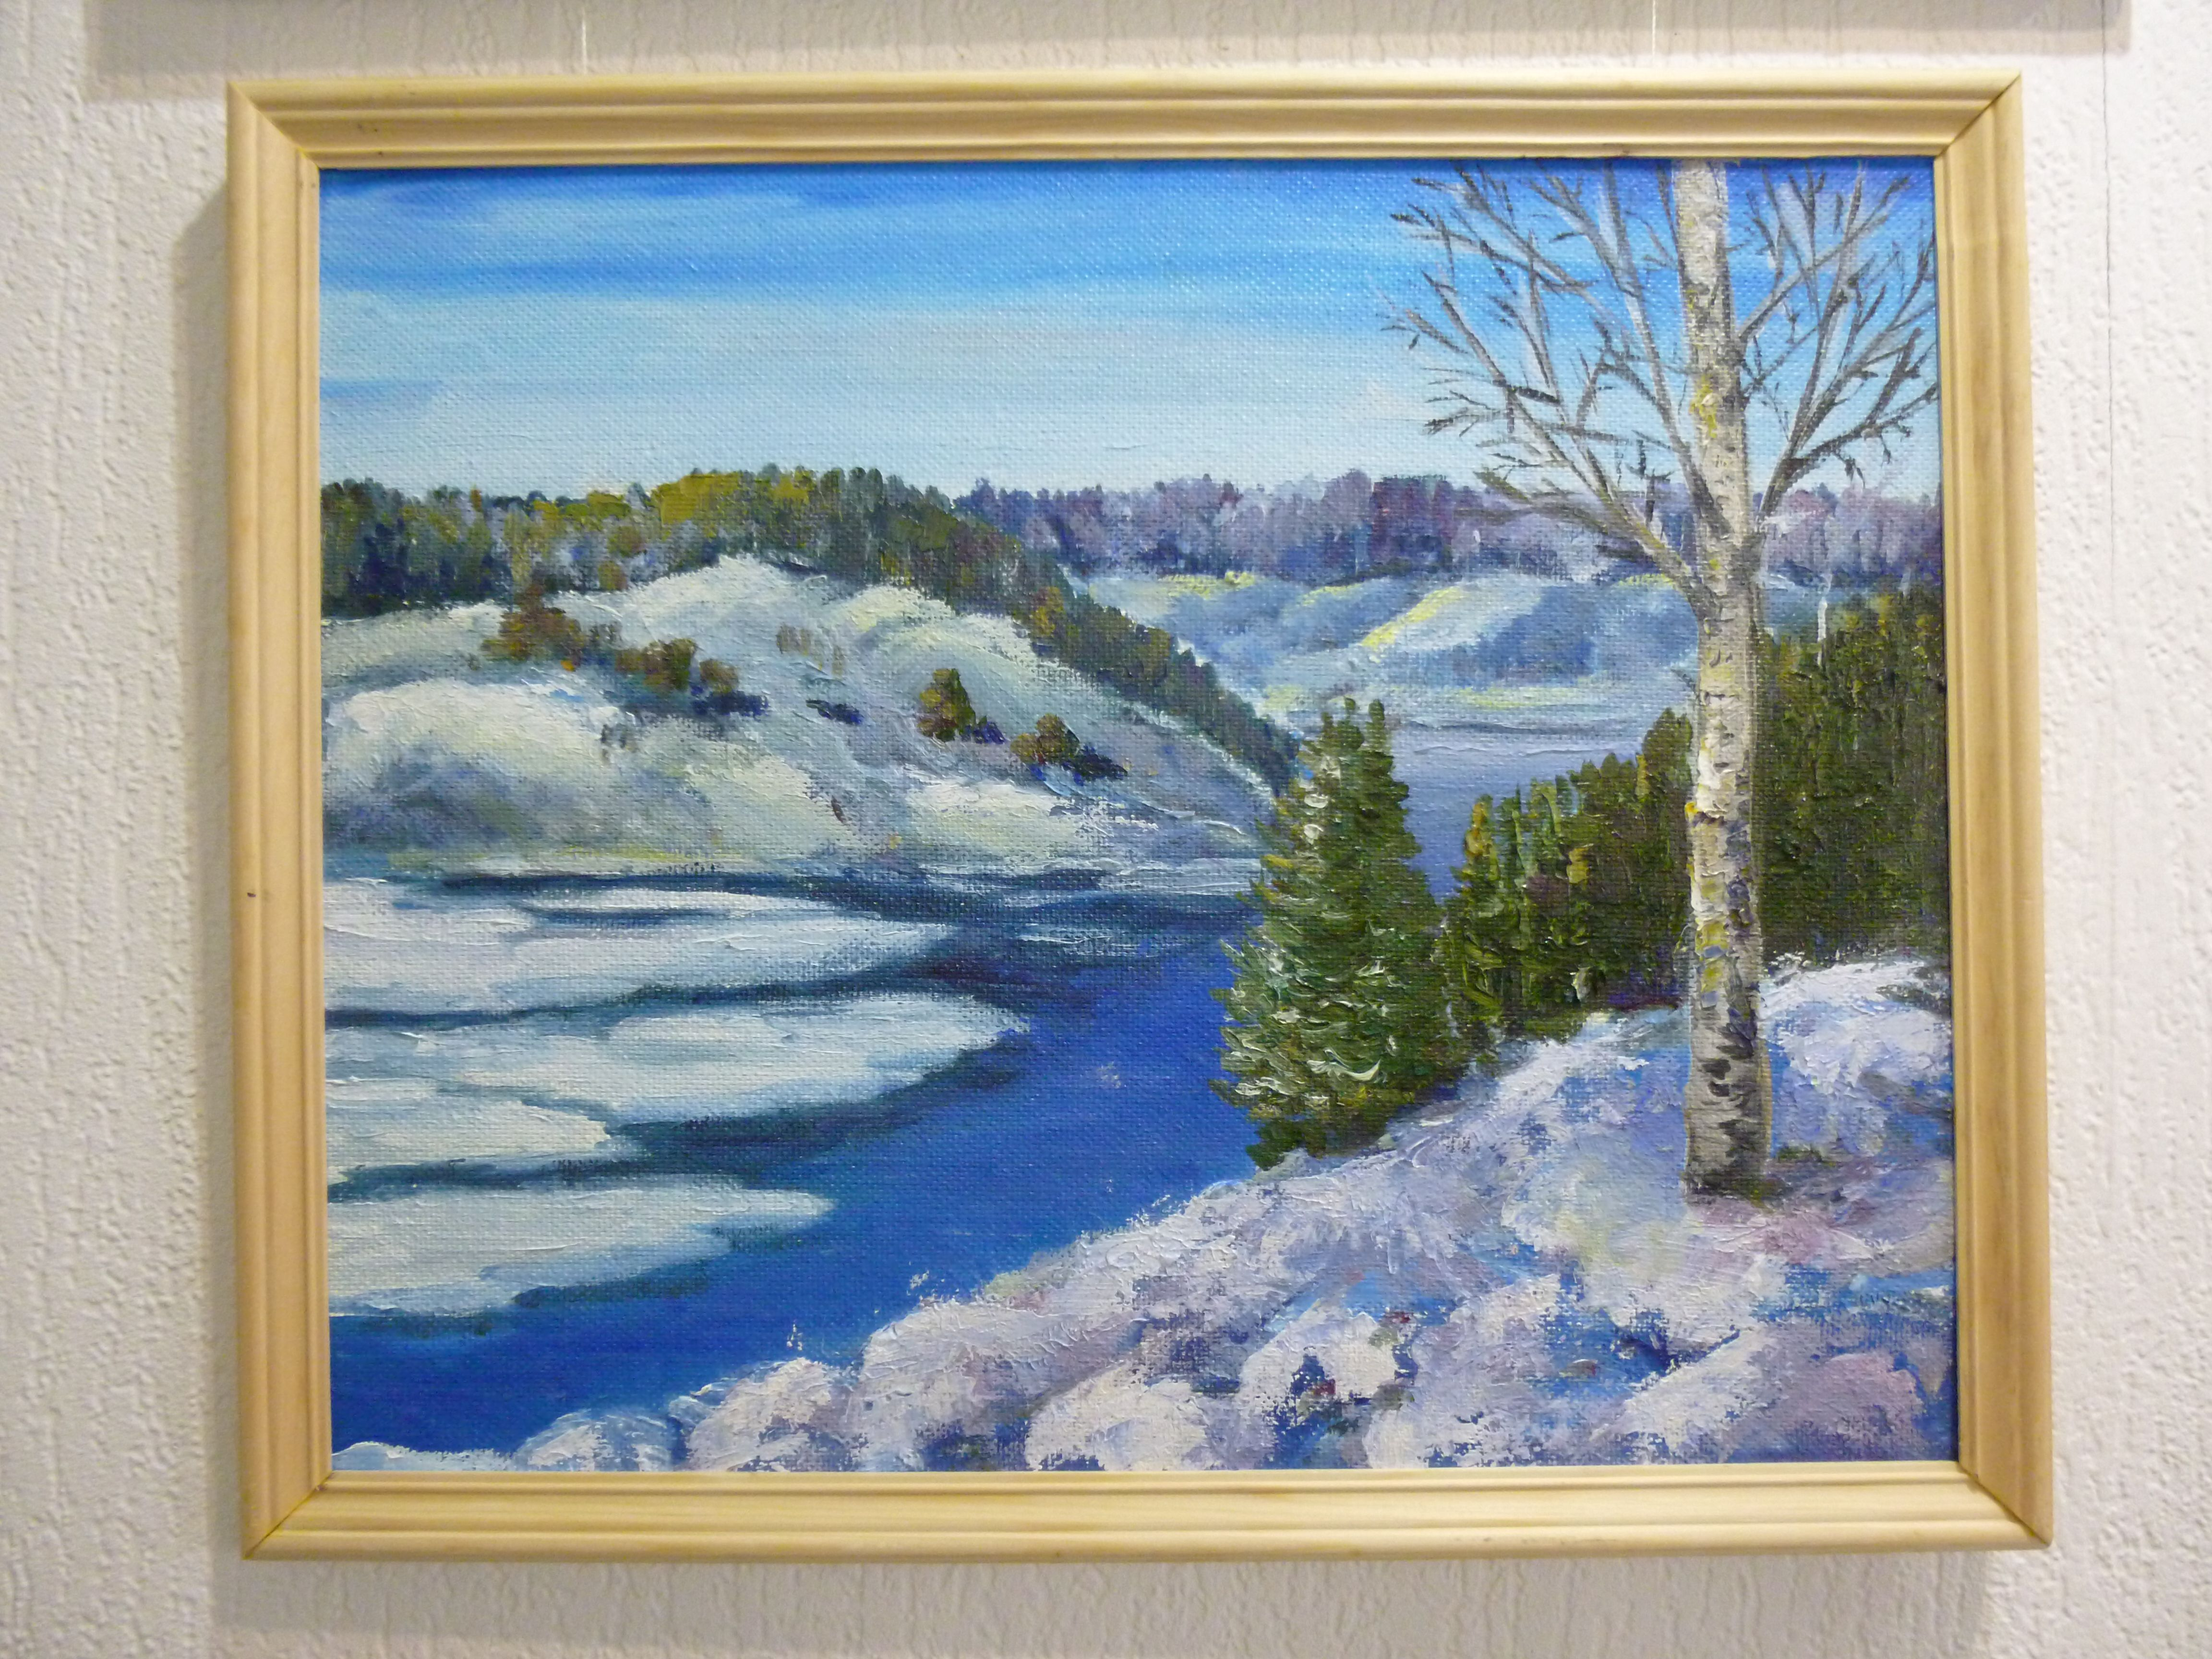 снег сопки голубой лес лед зима вода тает береза